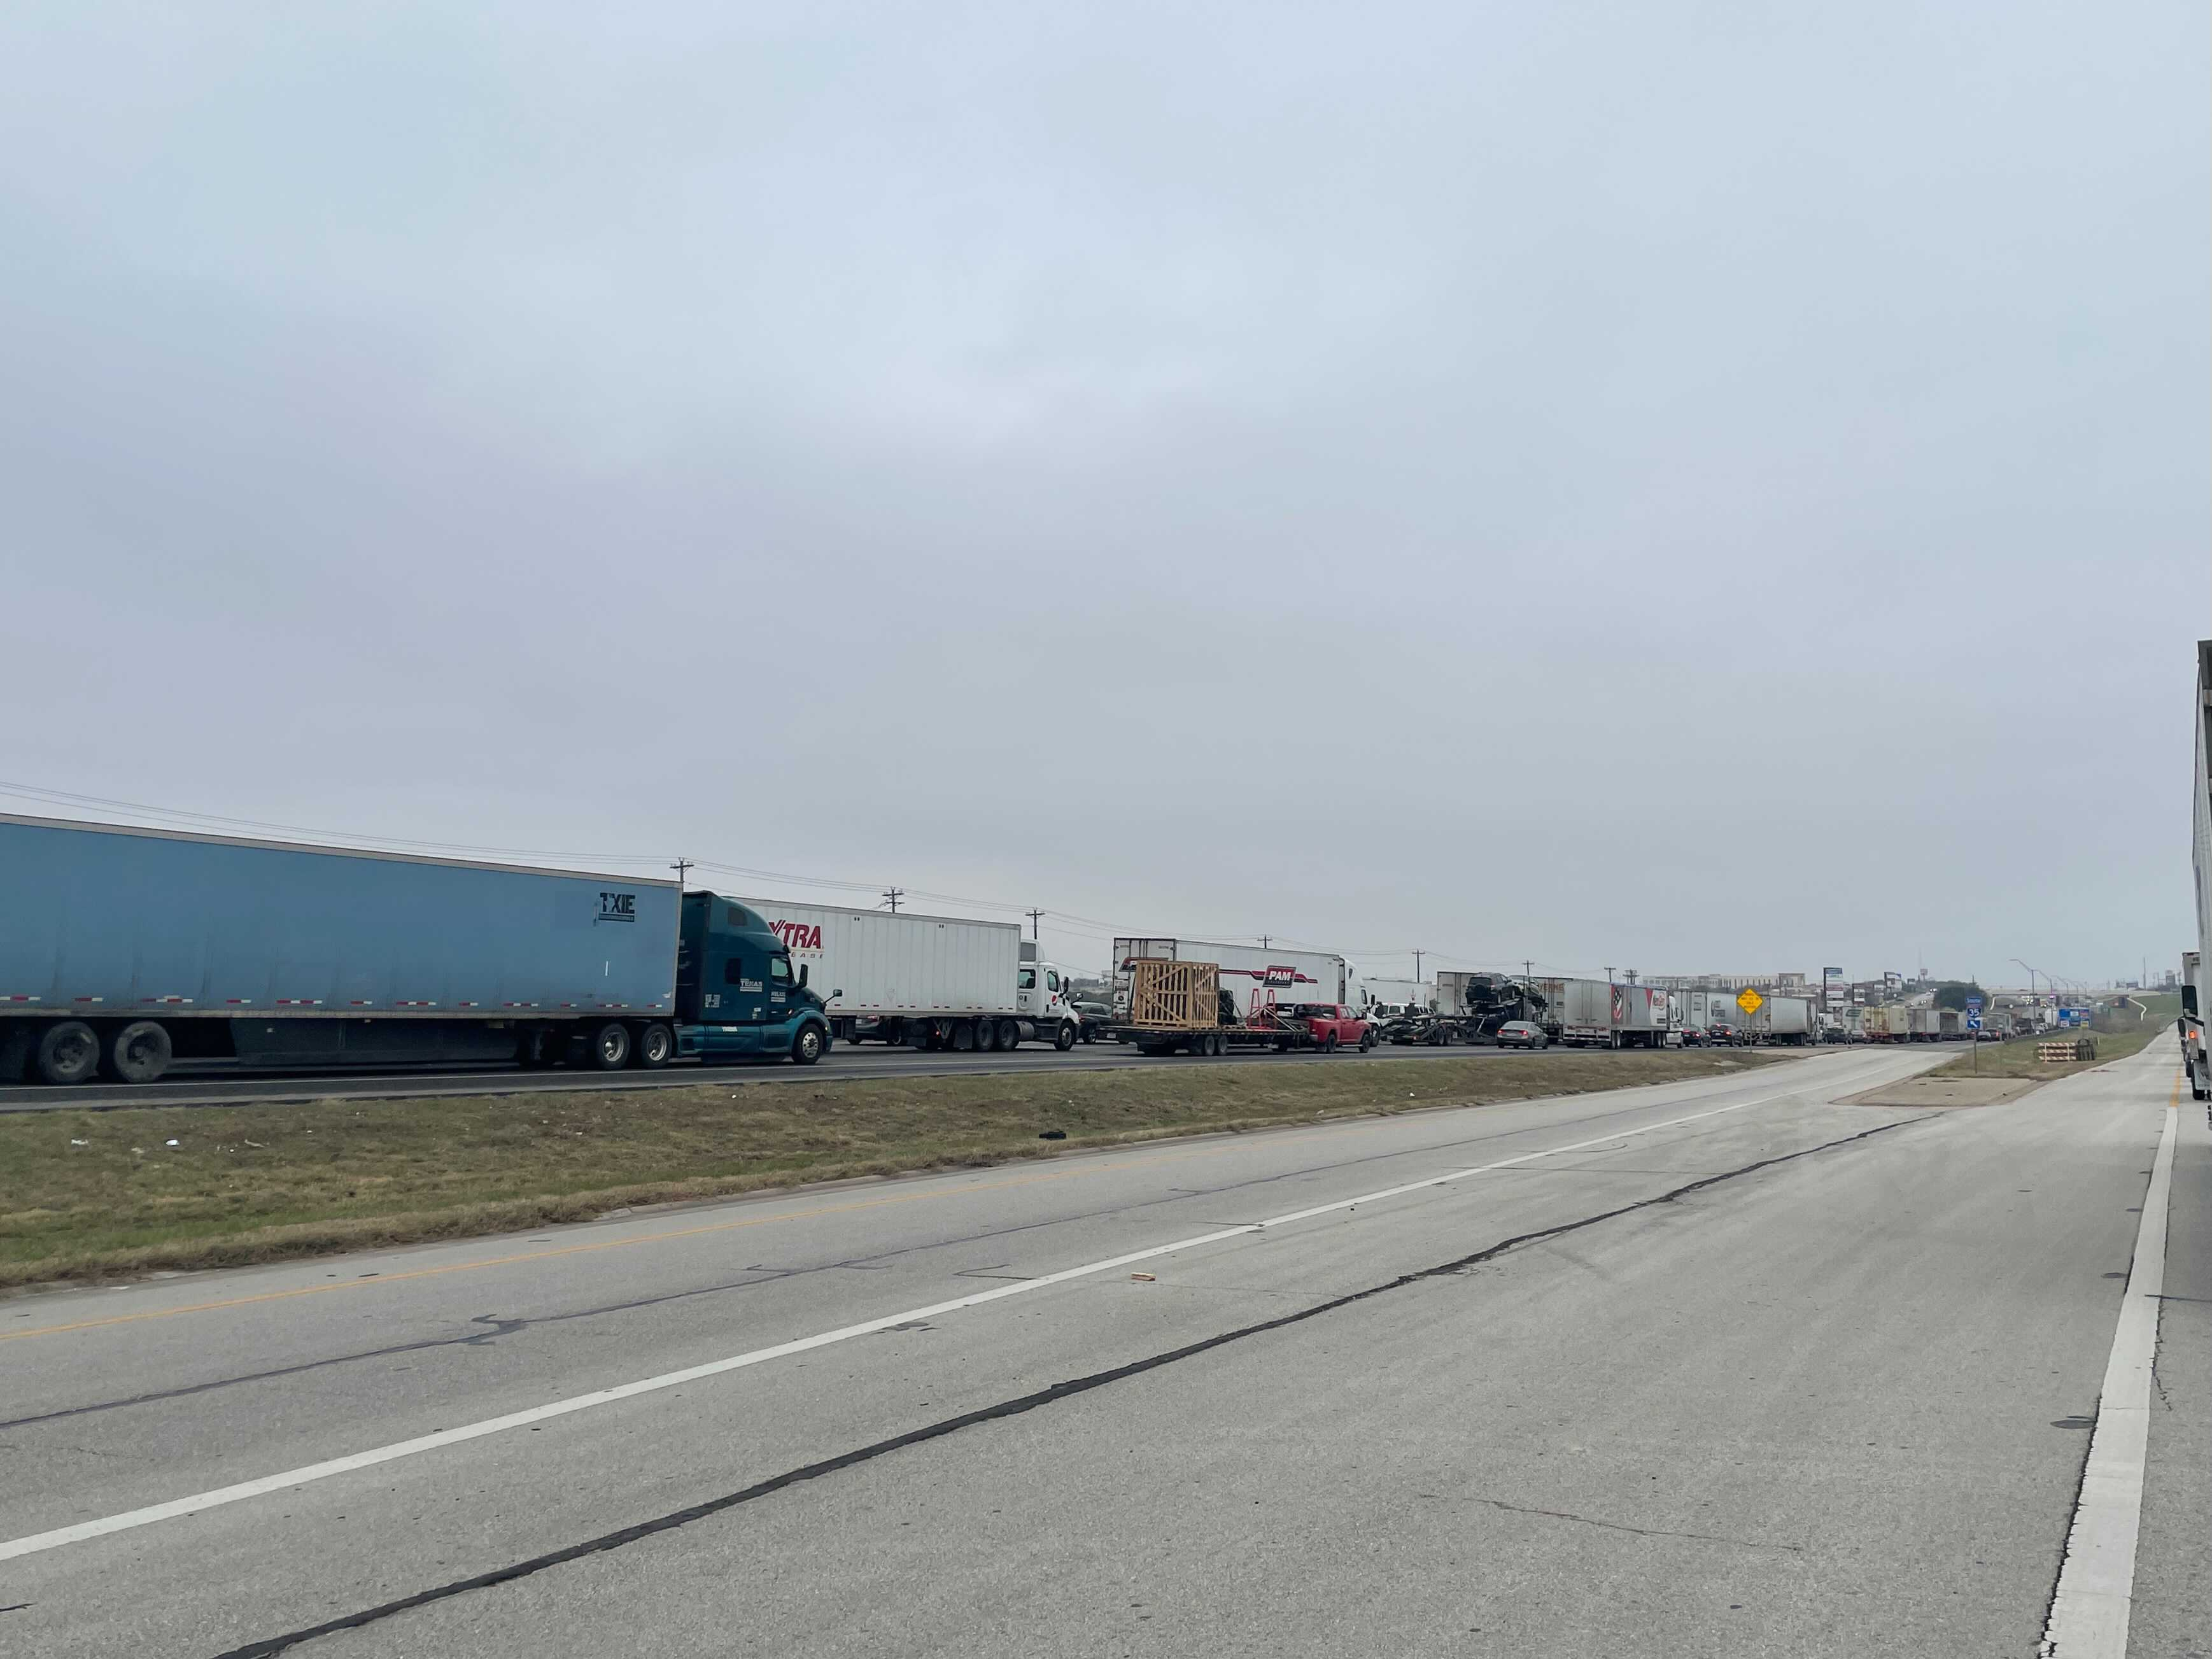 Backup on I-35 south Feb. 12, 2021 after a crash near mile marker 214 (KXAN Photo/Nick Bannin)